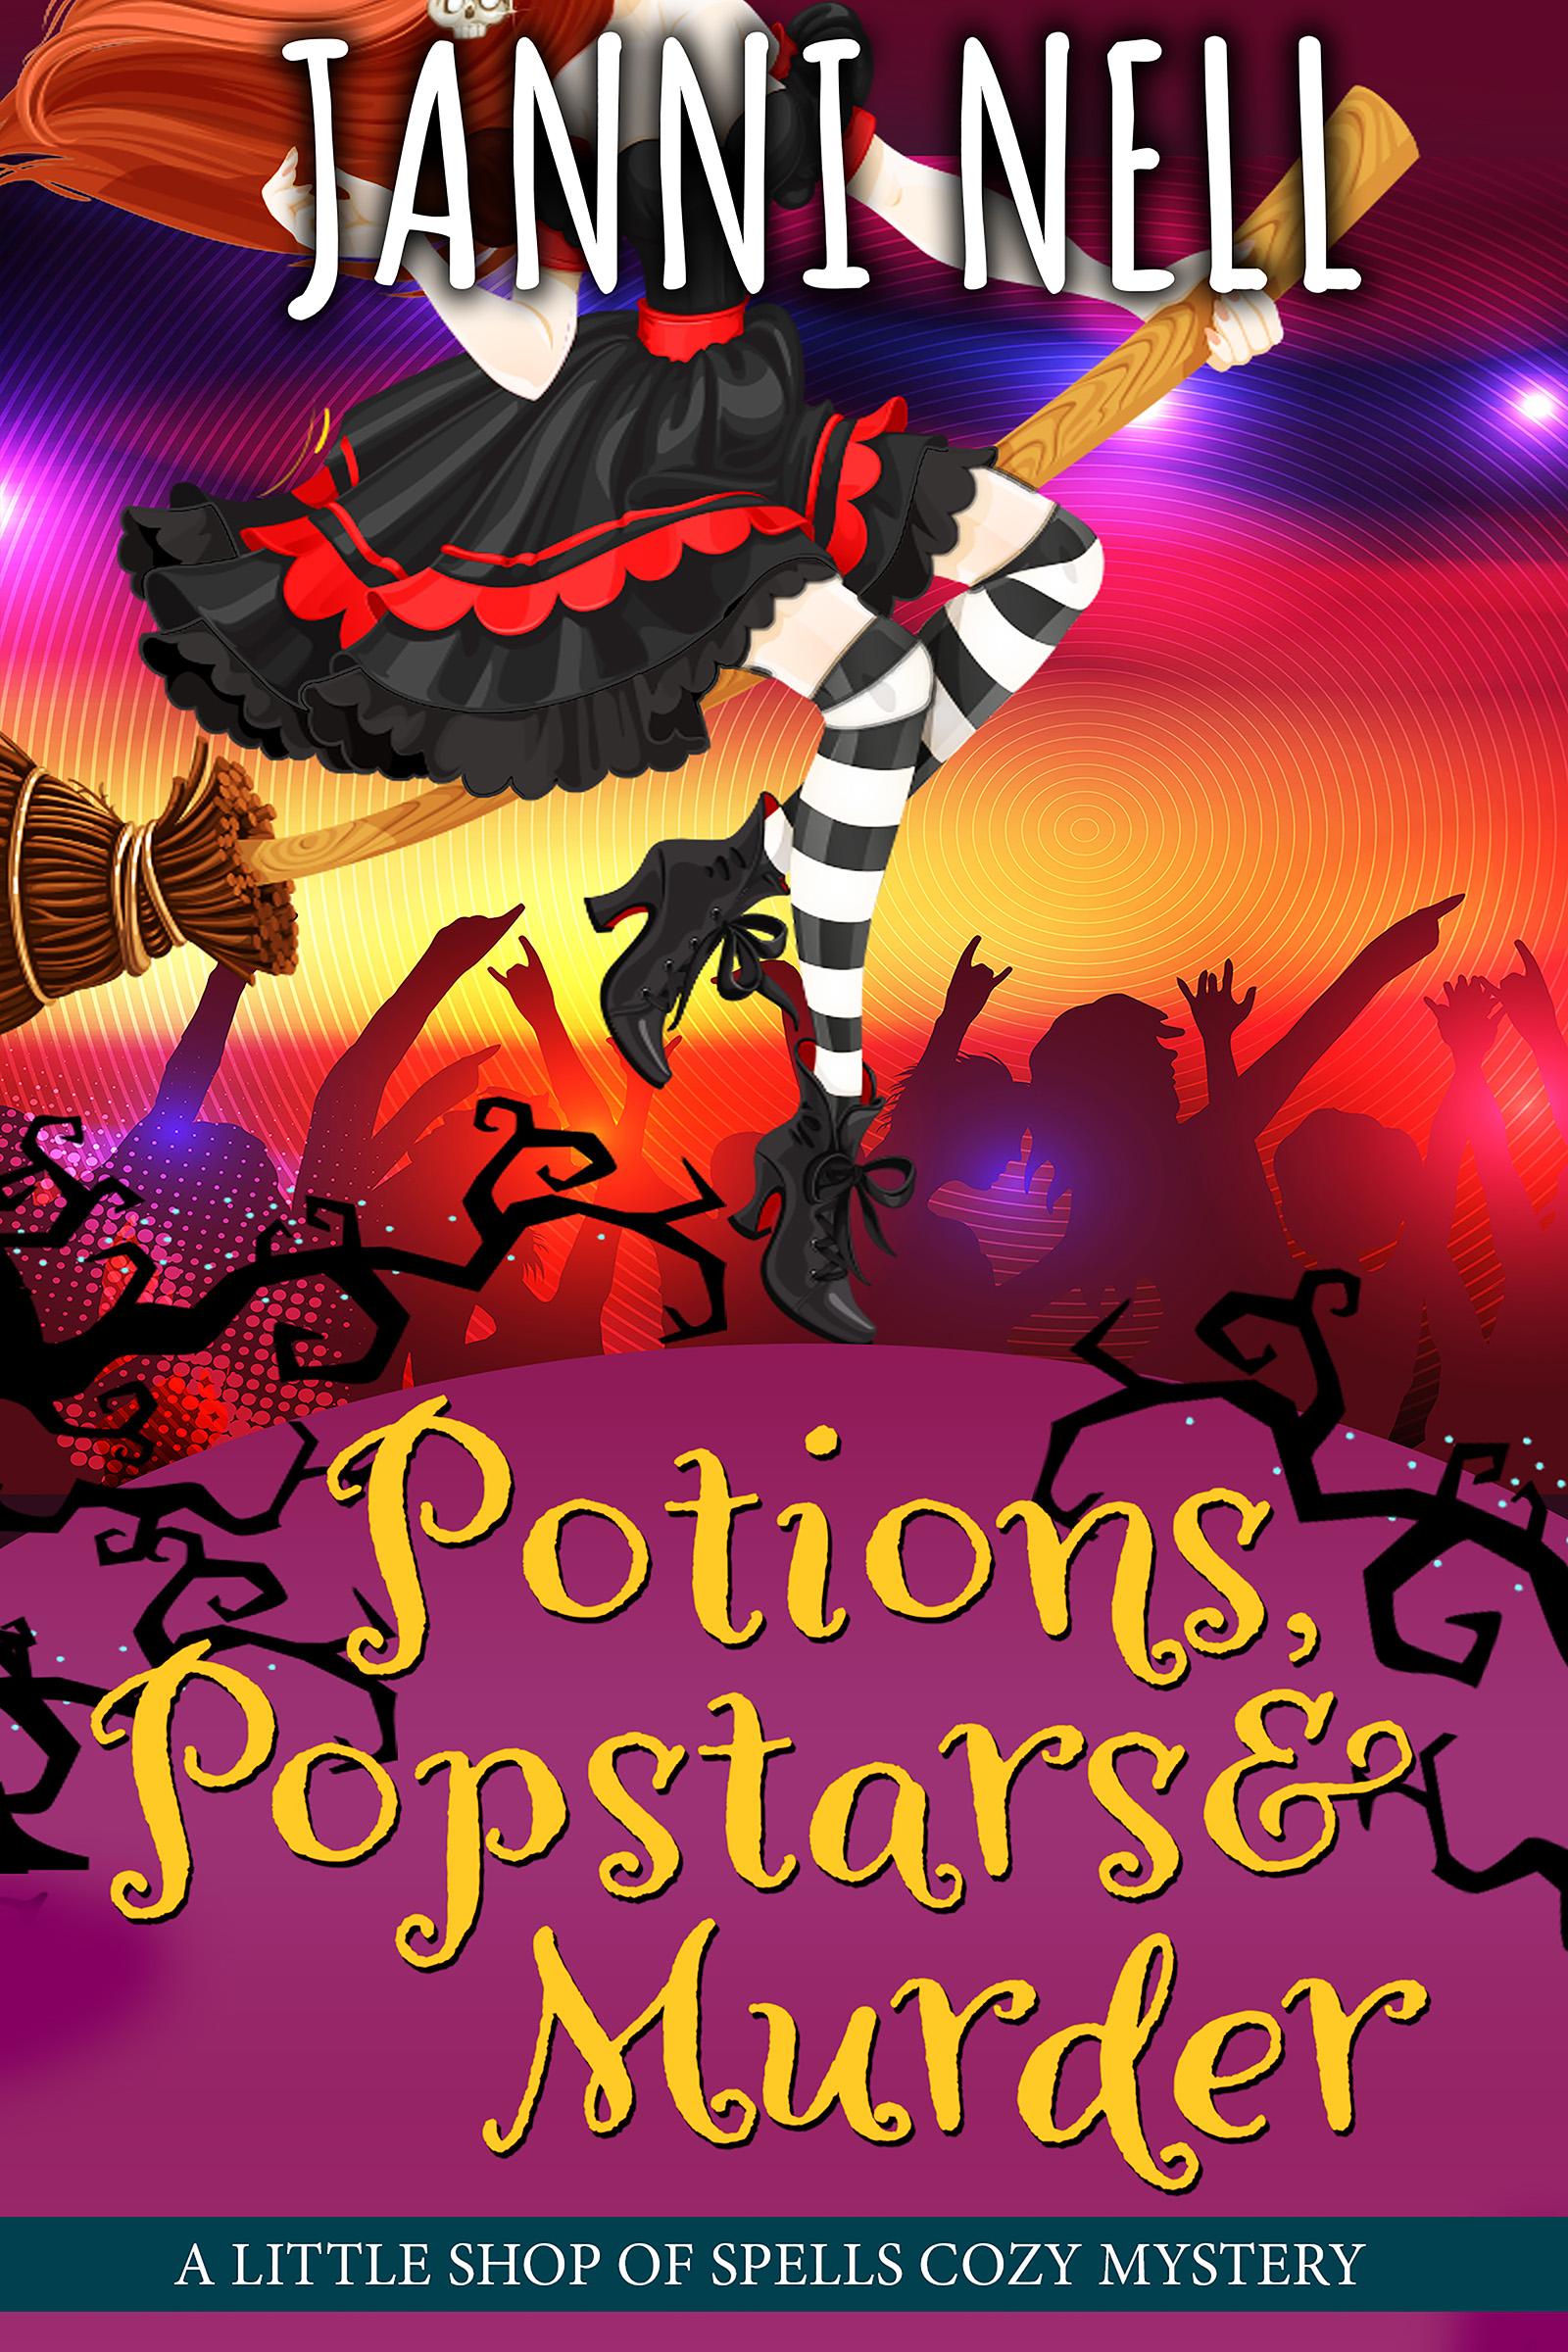 Potions, Popstars & Murder